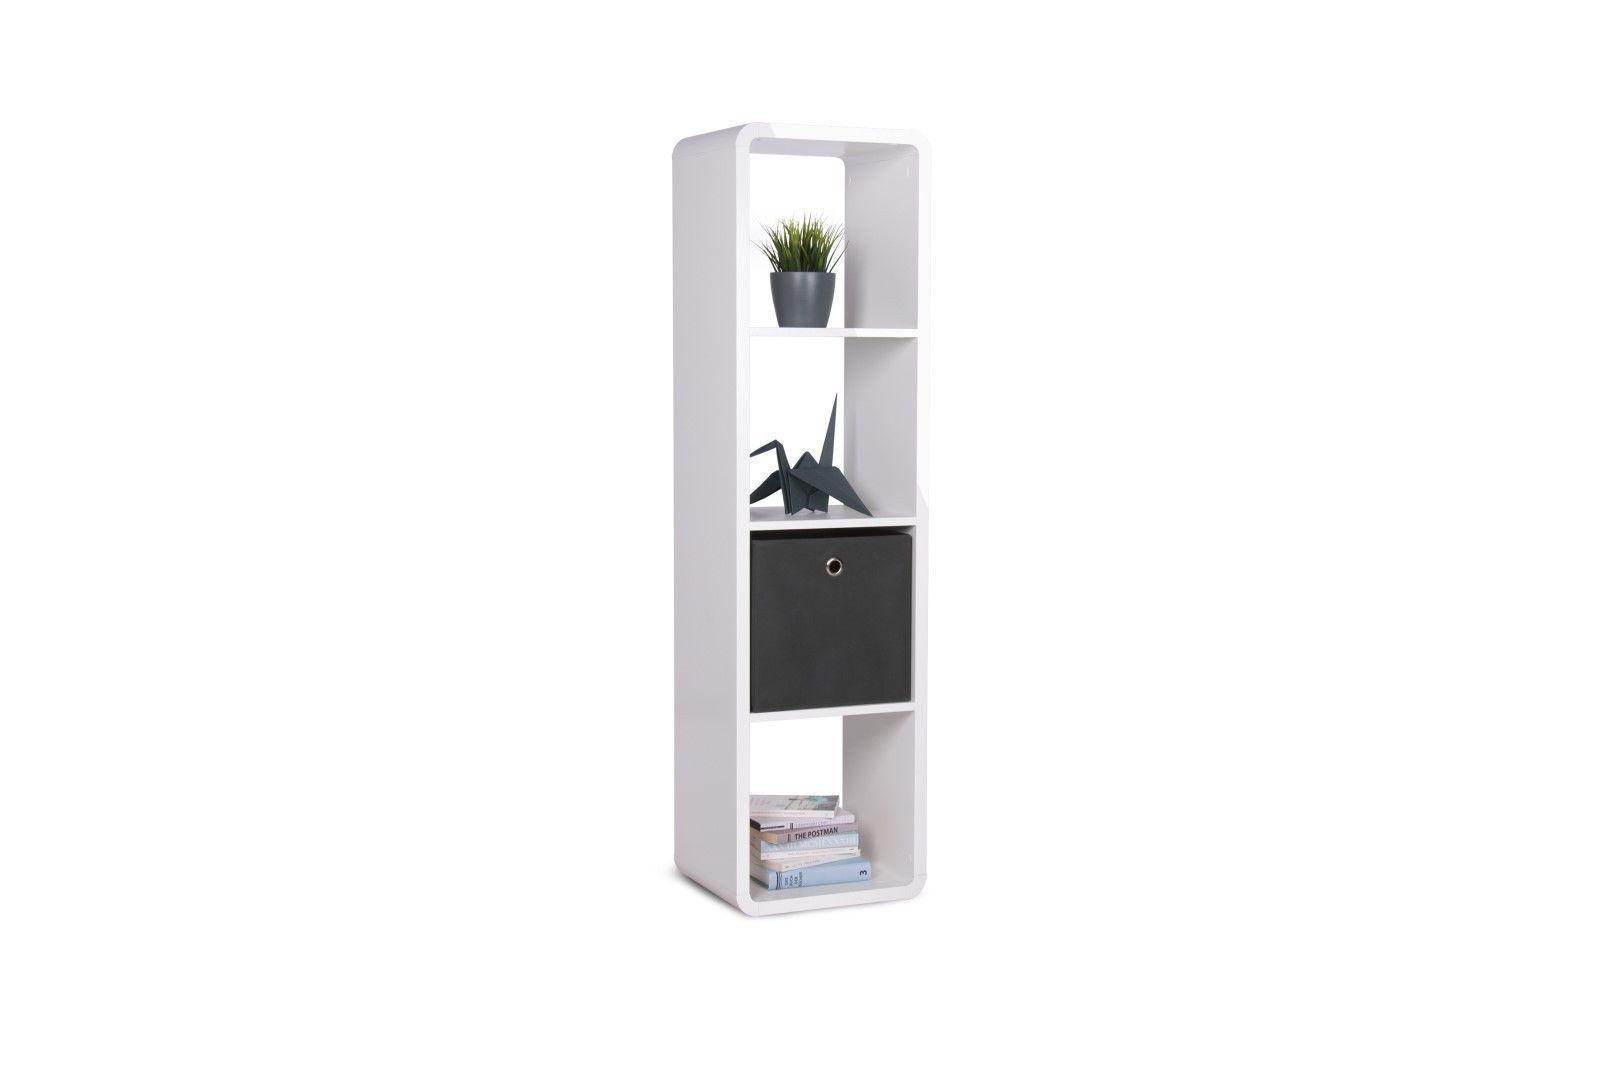 bcherregal 70 cm breit fabulous cheap regal cm hoch schrank cm hoch large size of oben breit. Black Bedroom Furniture Sets. Home Design Ideas